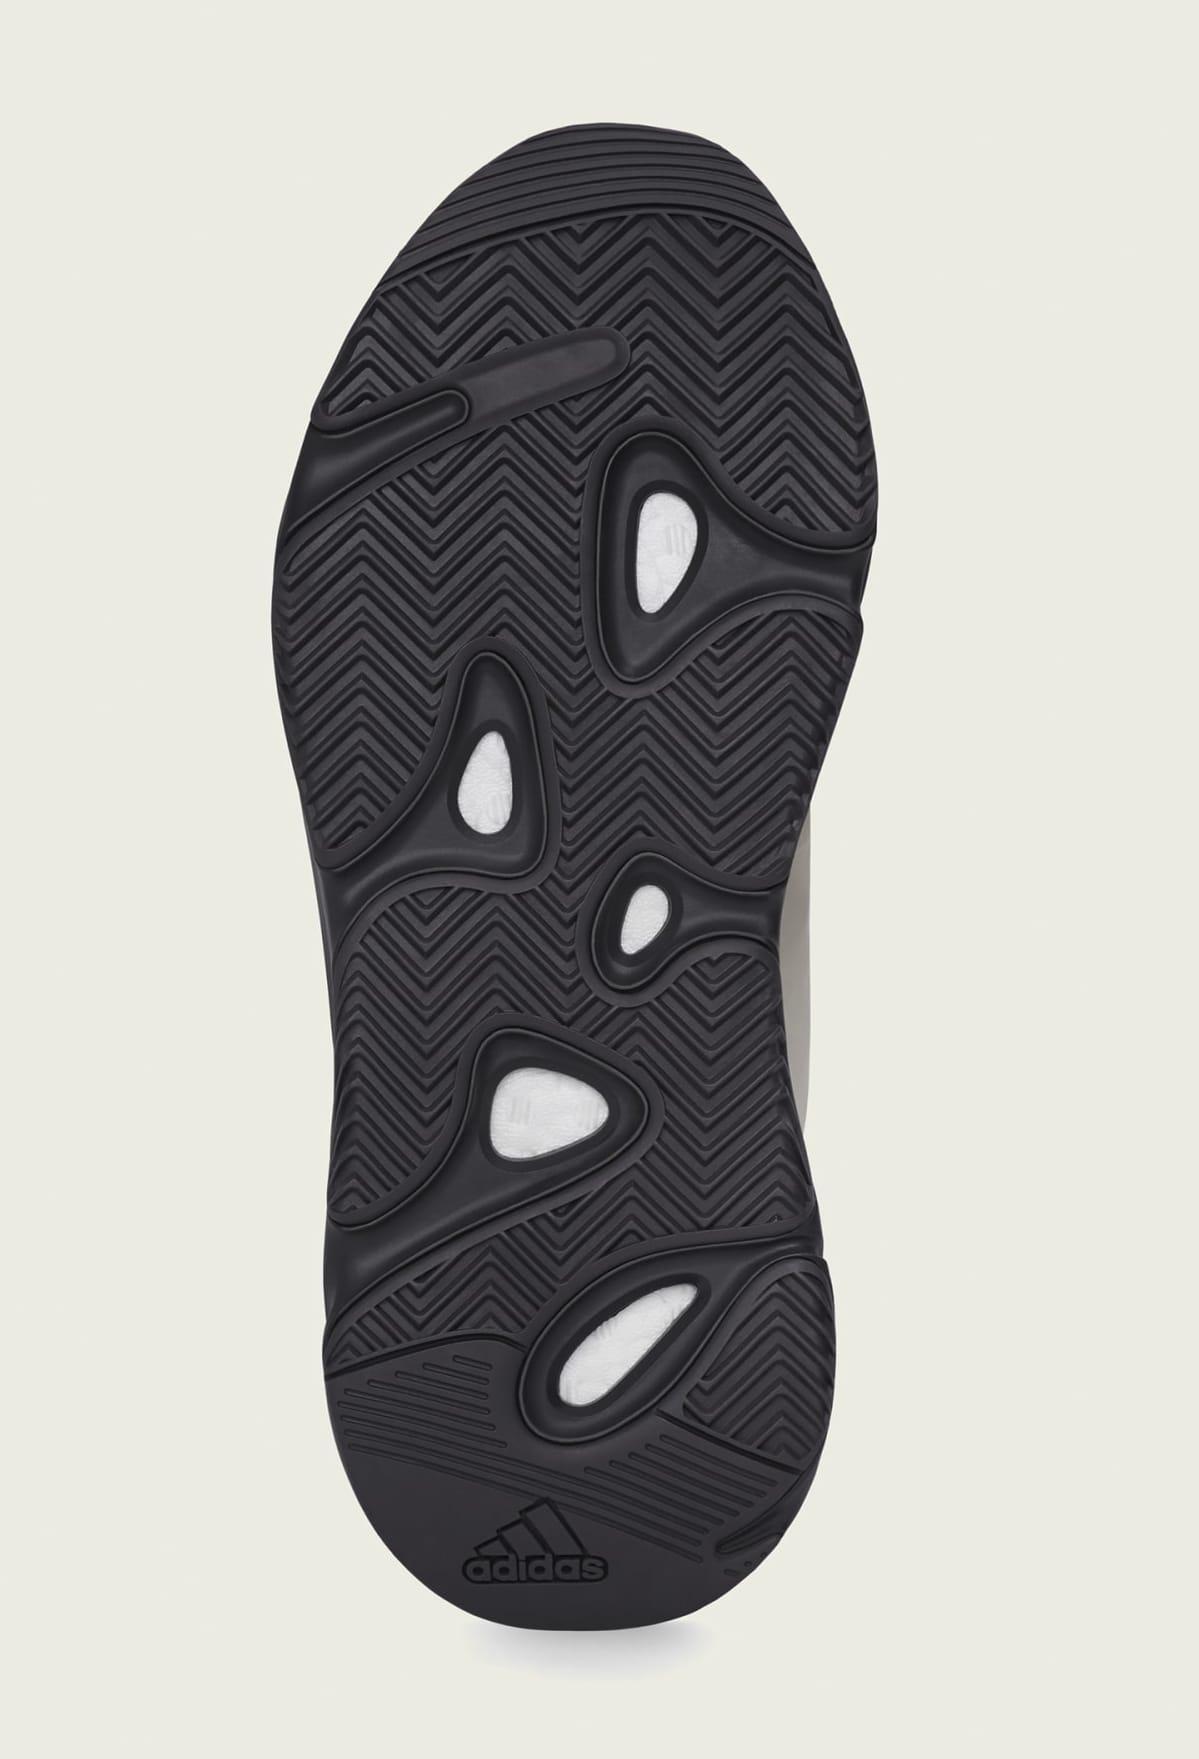 Adidas Yeezy Boost 700 MNVN 'Bone' FY3729 Outsole